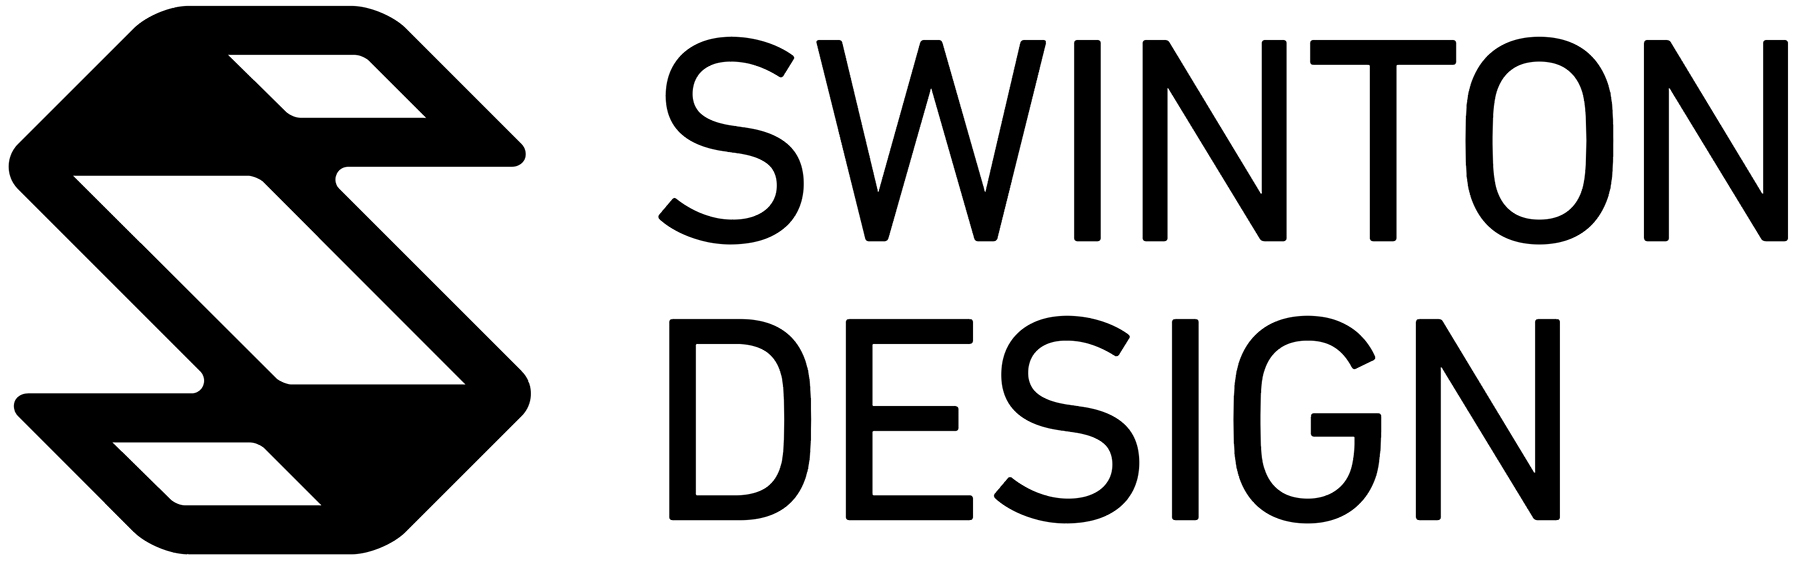 Swinton Design